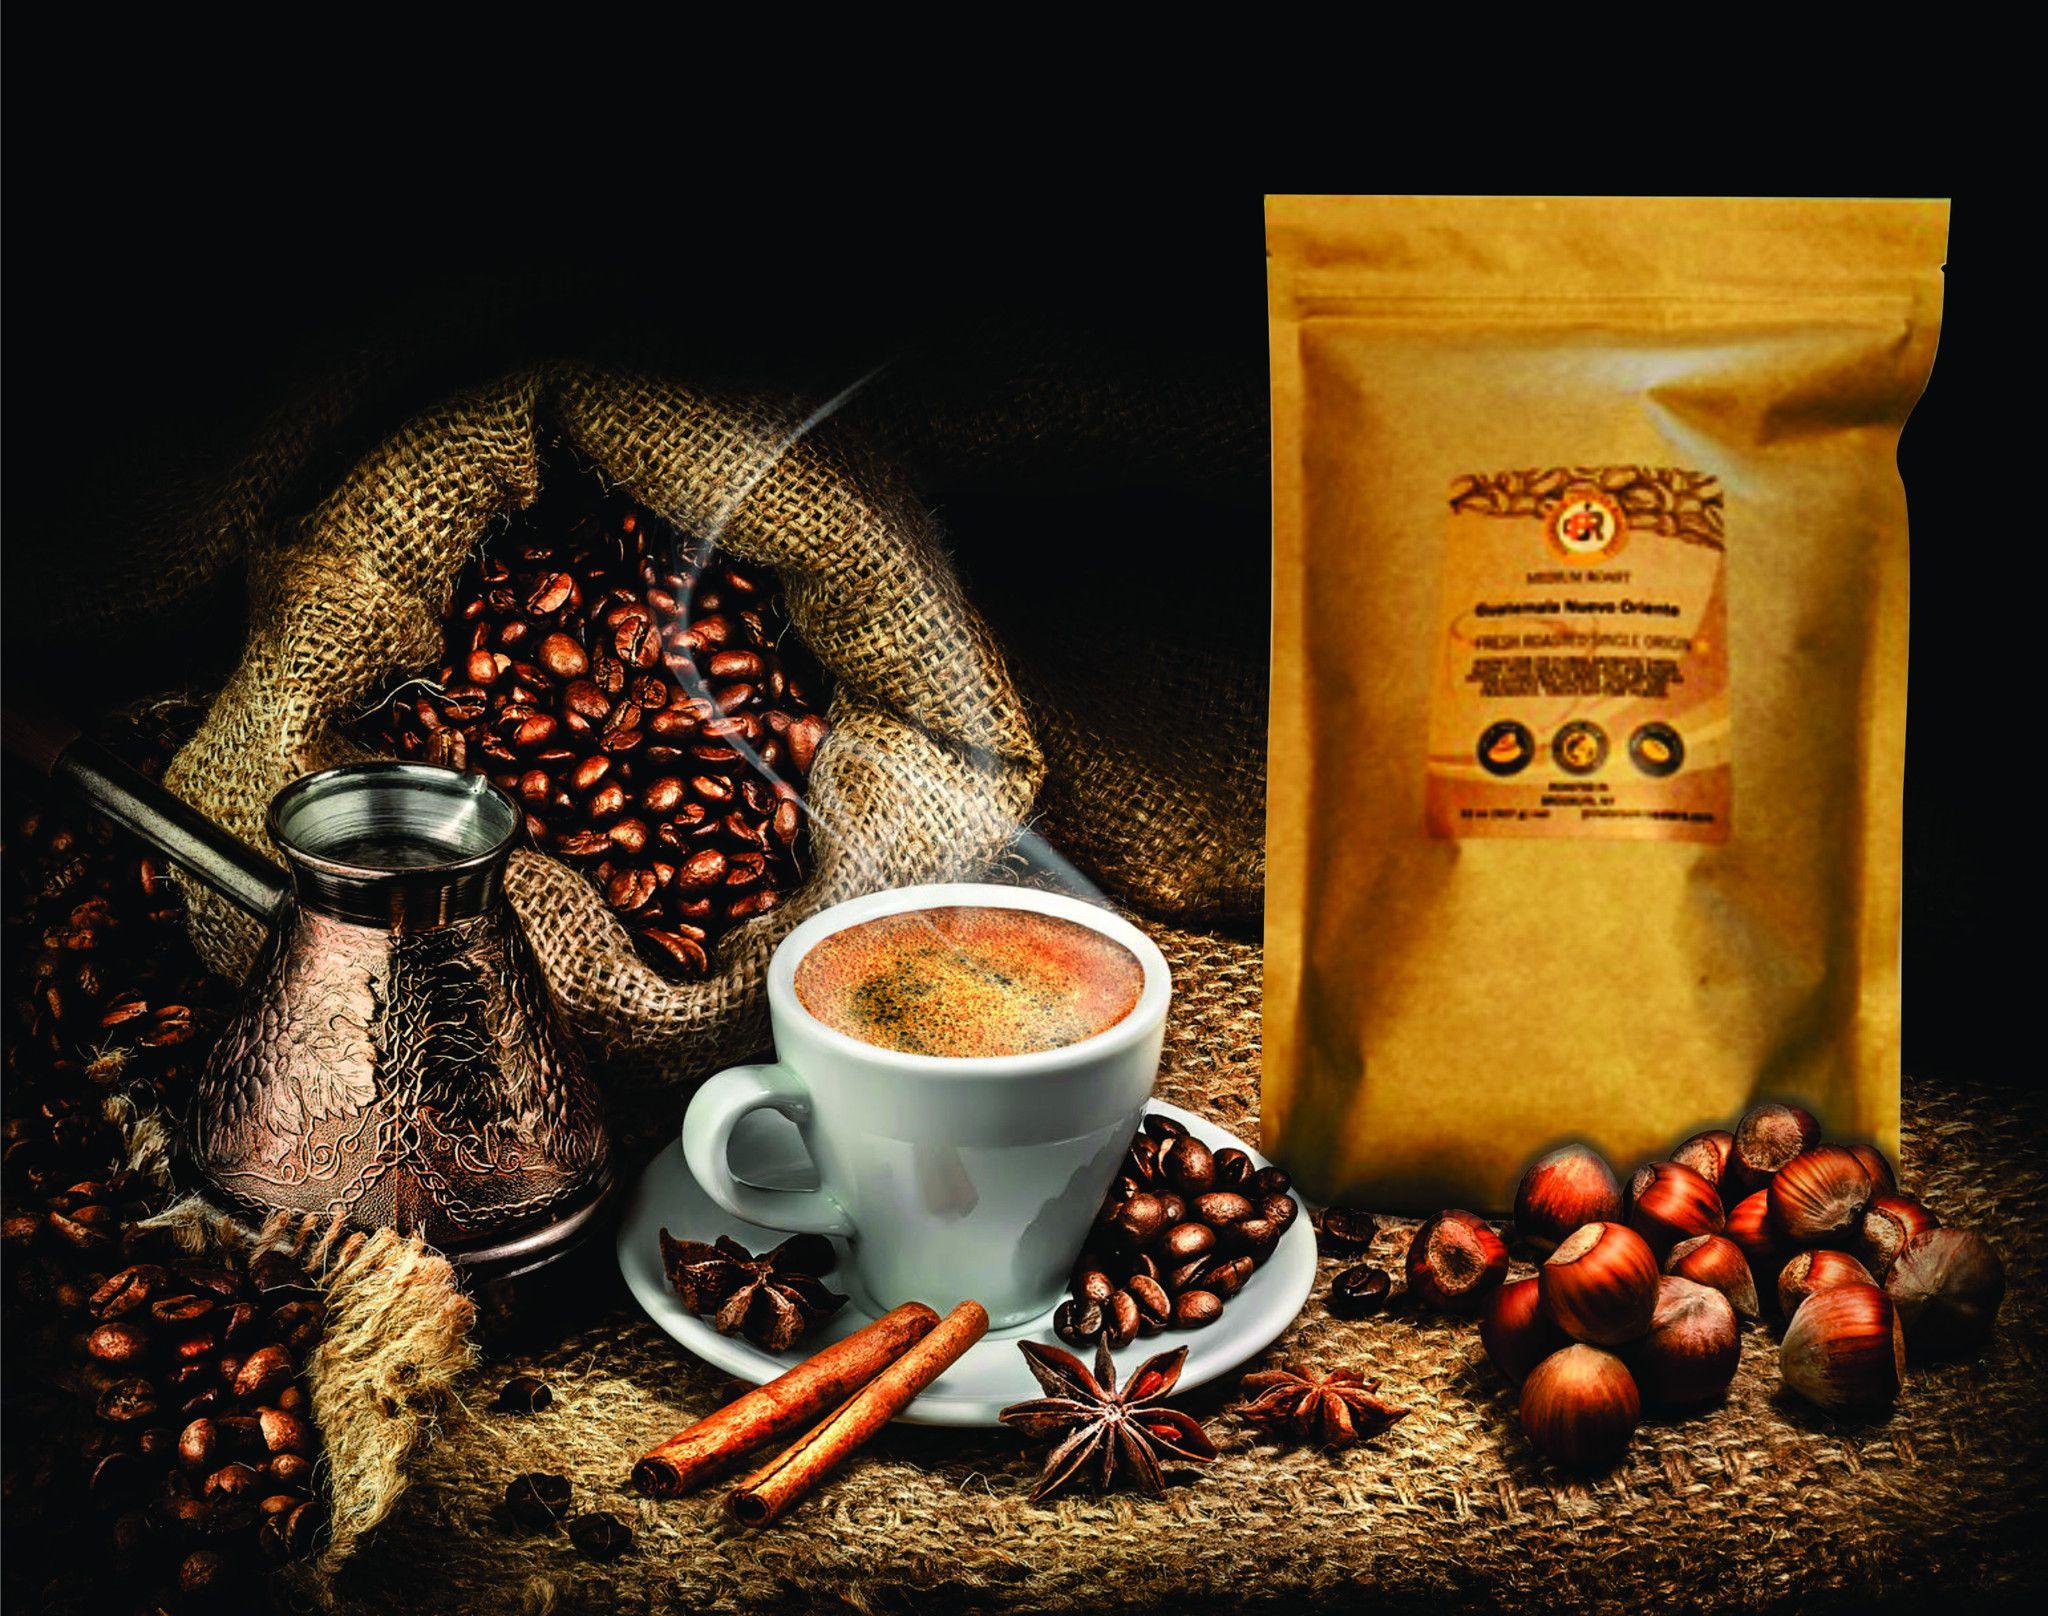 Guatemala nuevo oriente 100 fresh roasted coffee beans